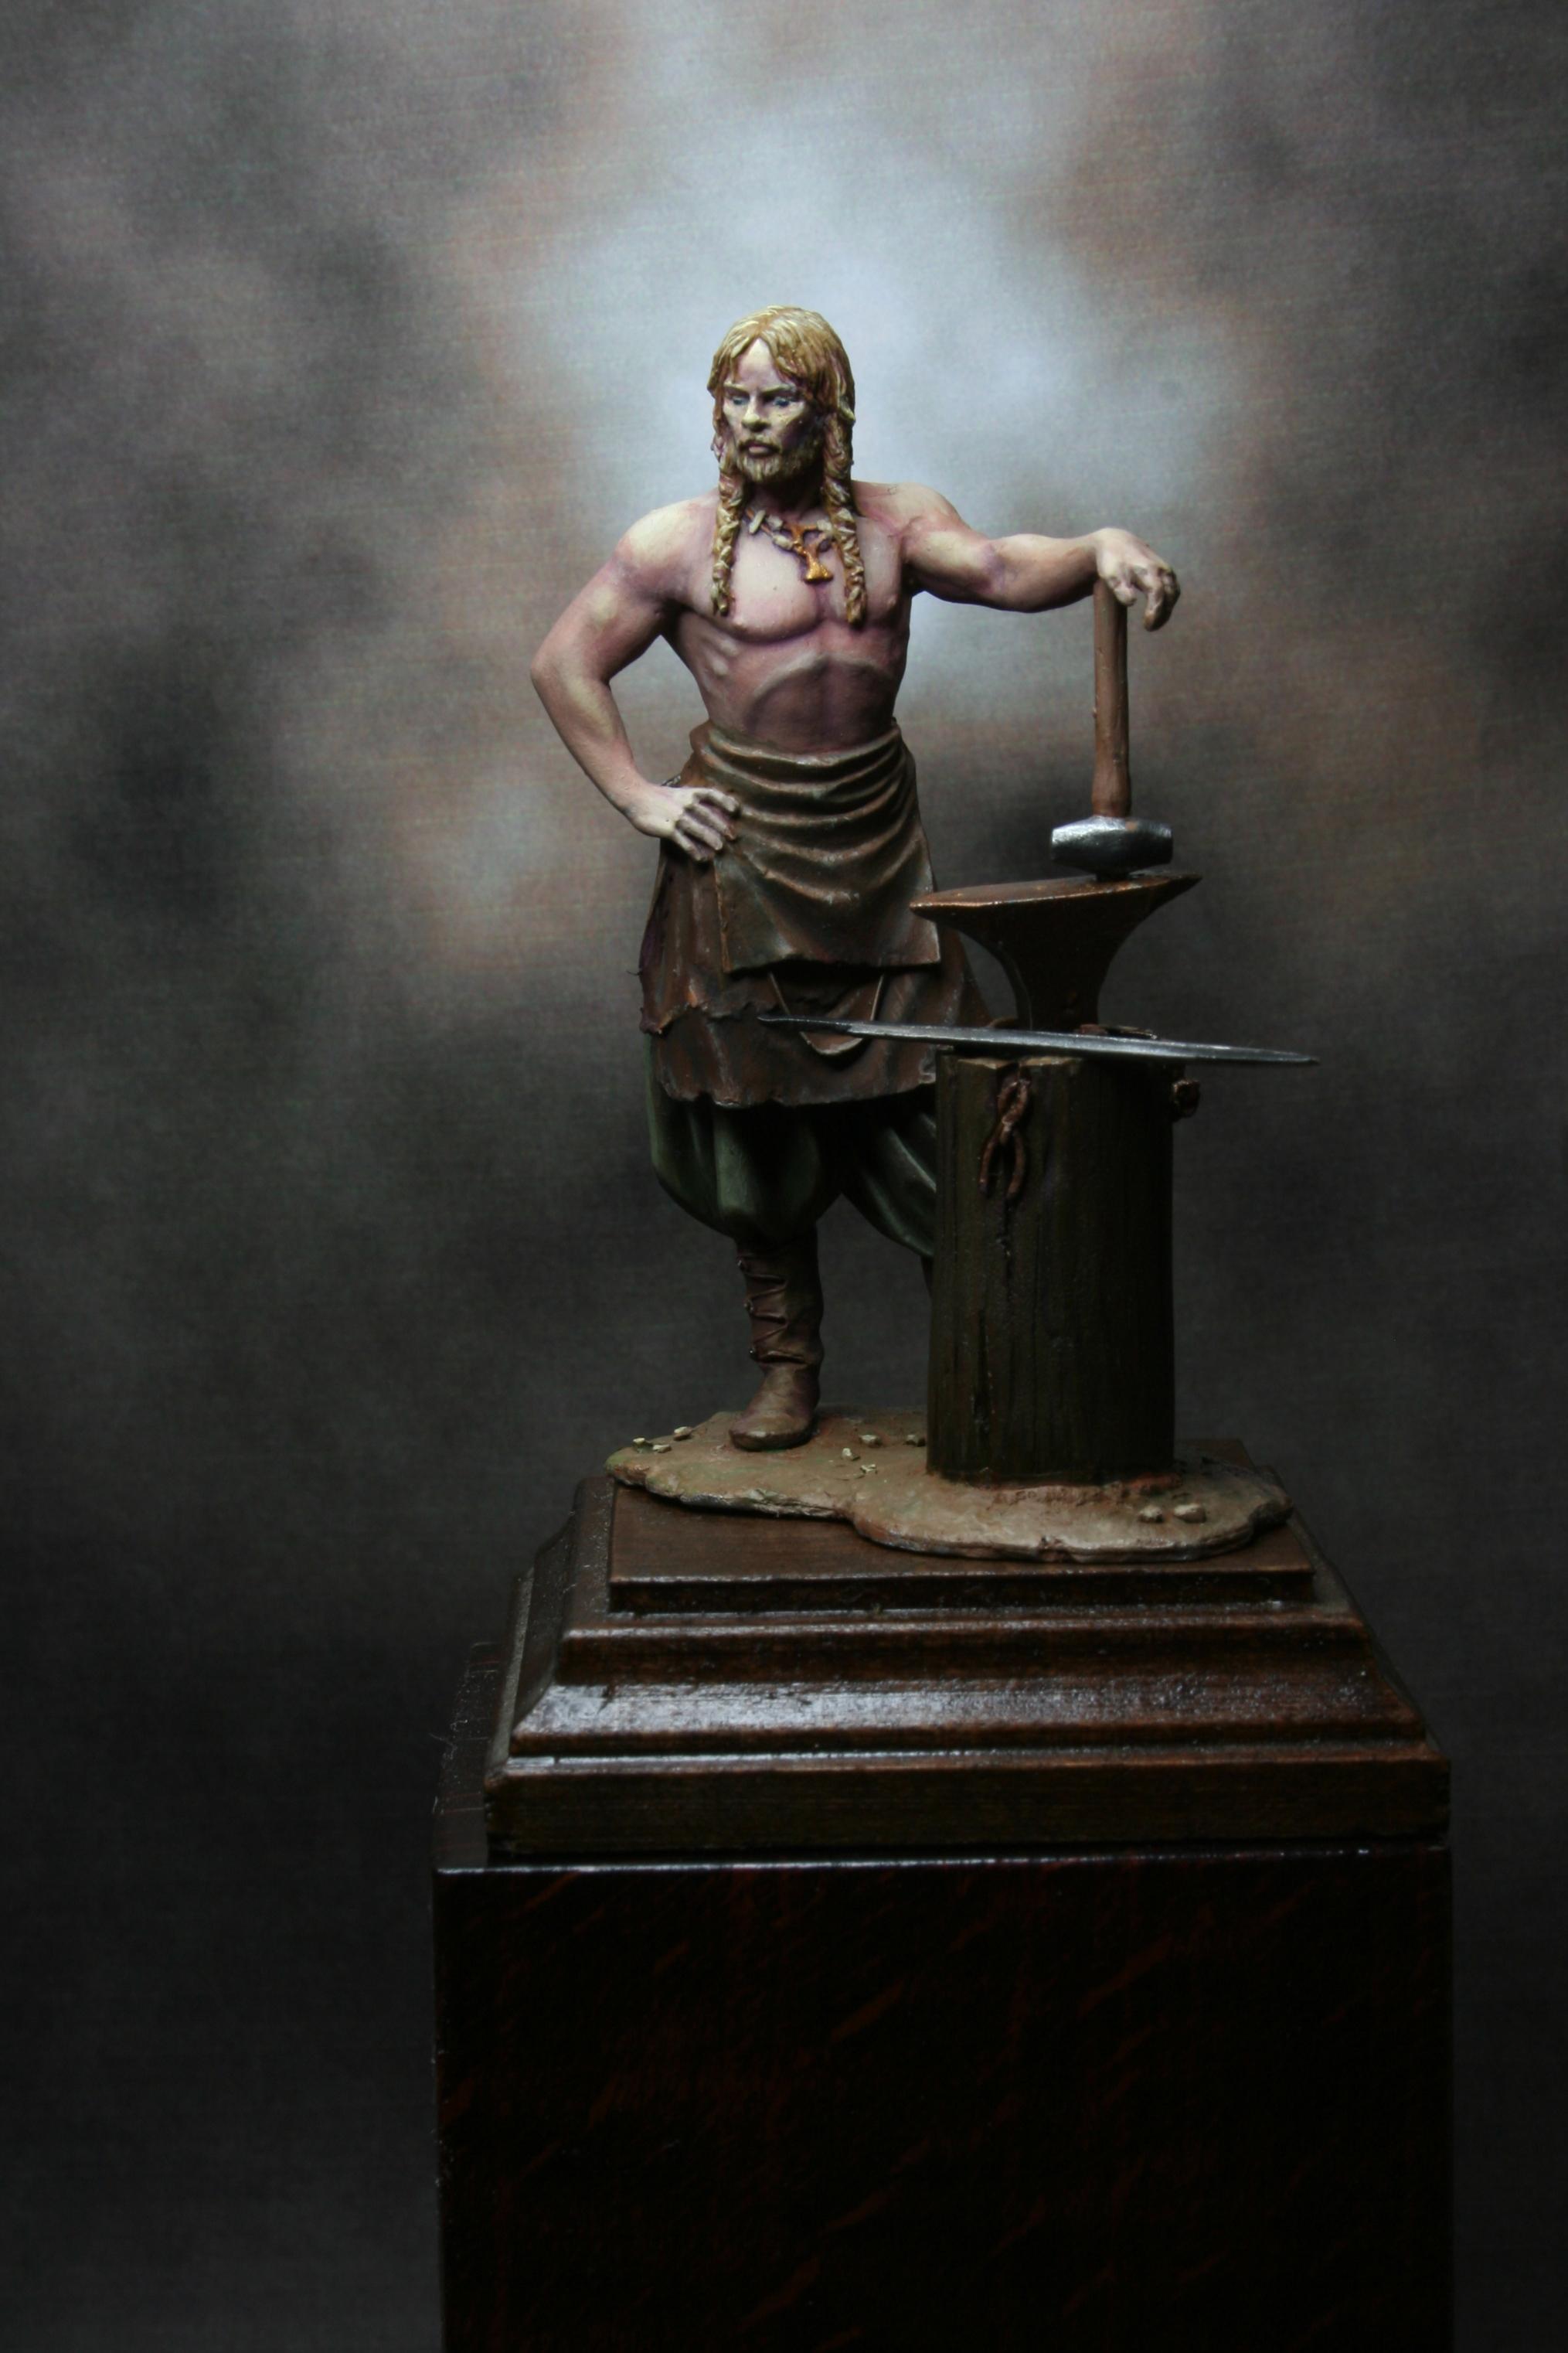 Norse Blacksmith 750 A.D. Img4fb495fdc2a1b